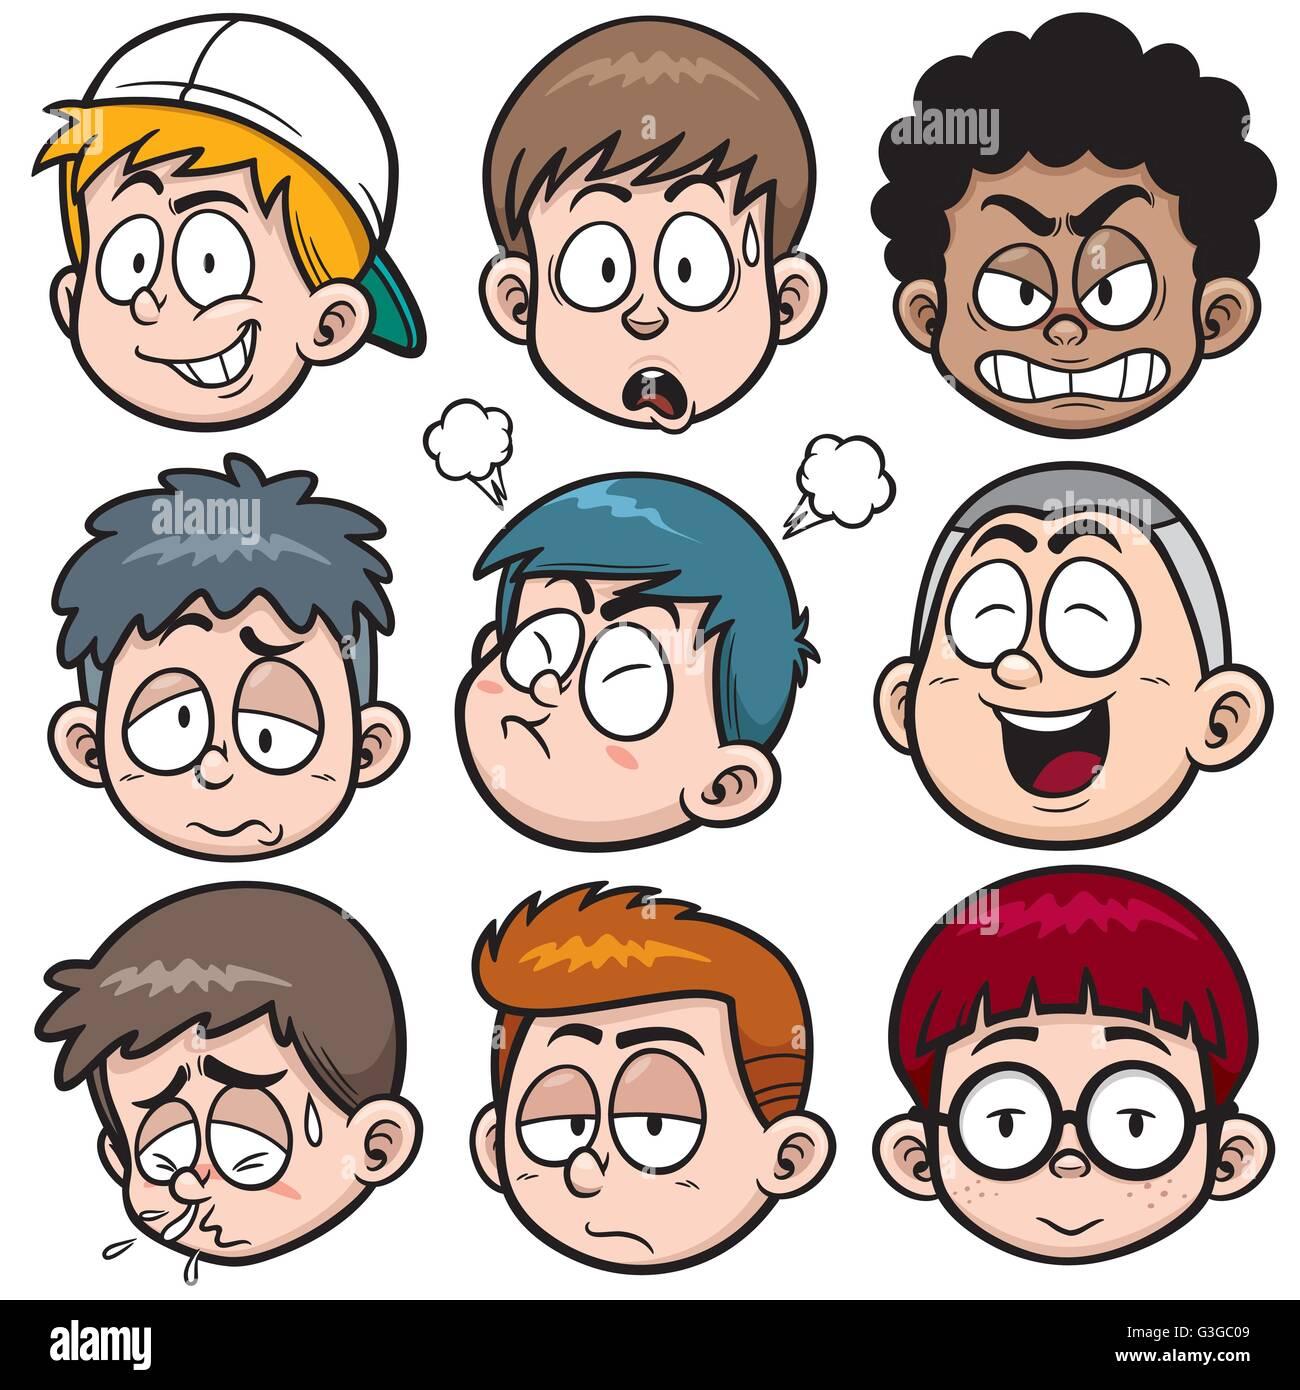 Vector illustration of Boy face cartoon set - Stock Vector